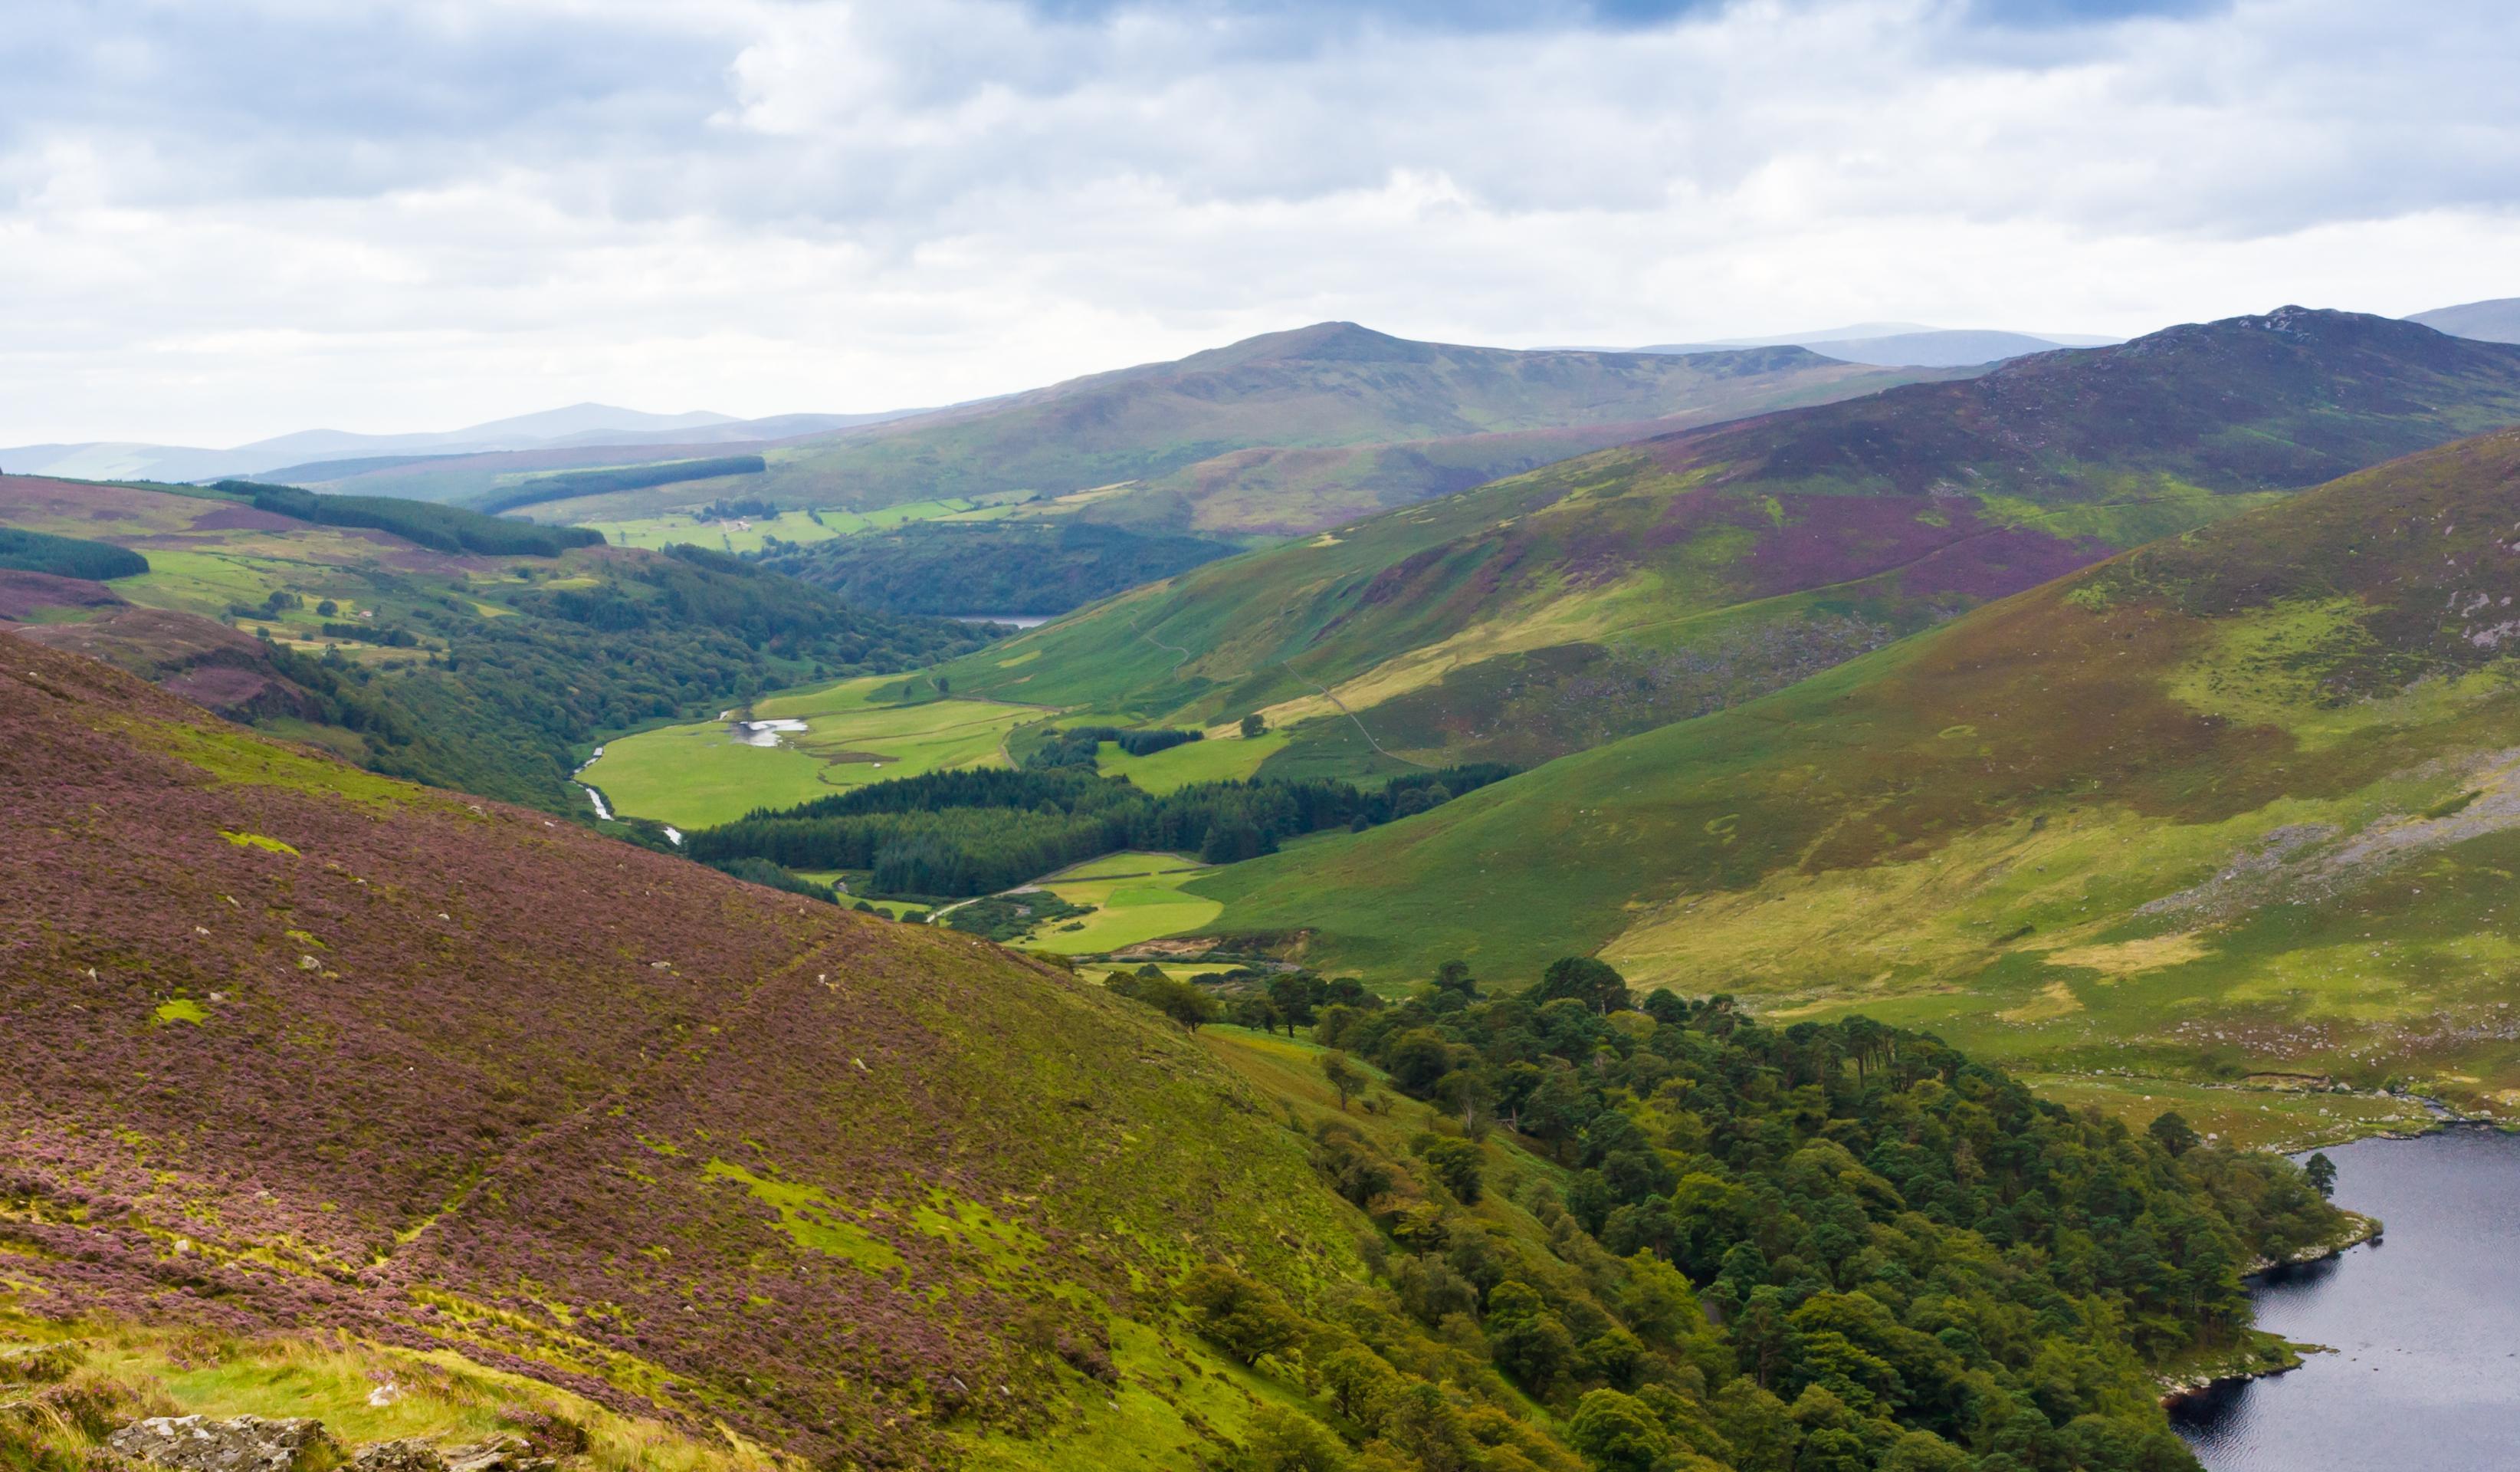 ,Excursión a Wicklow,Excursión a Wicklow y Glendalough,Excursión a Glendalough y Wicklow